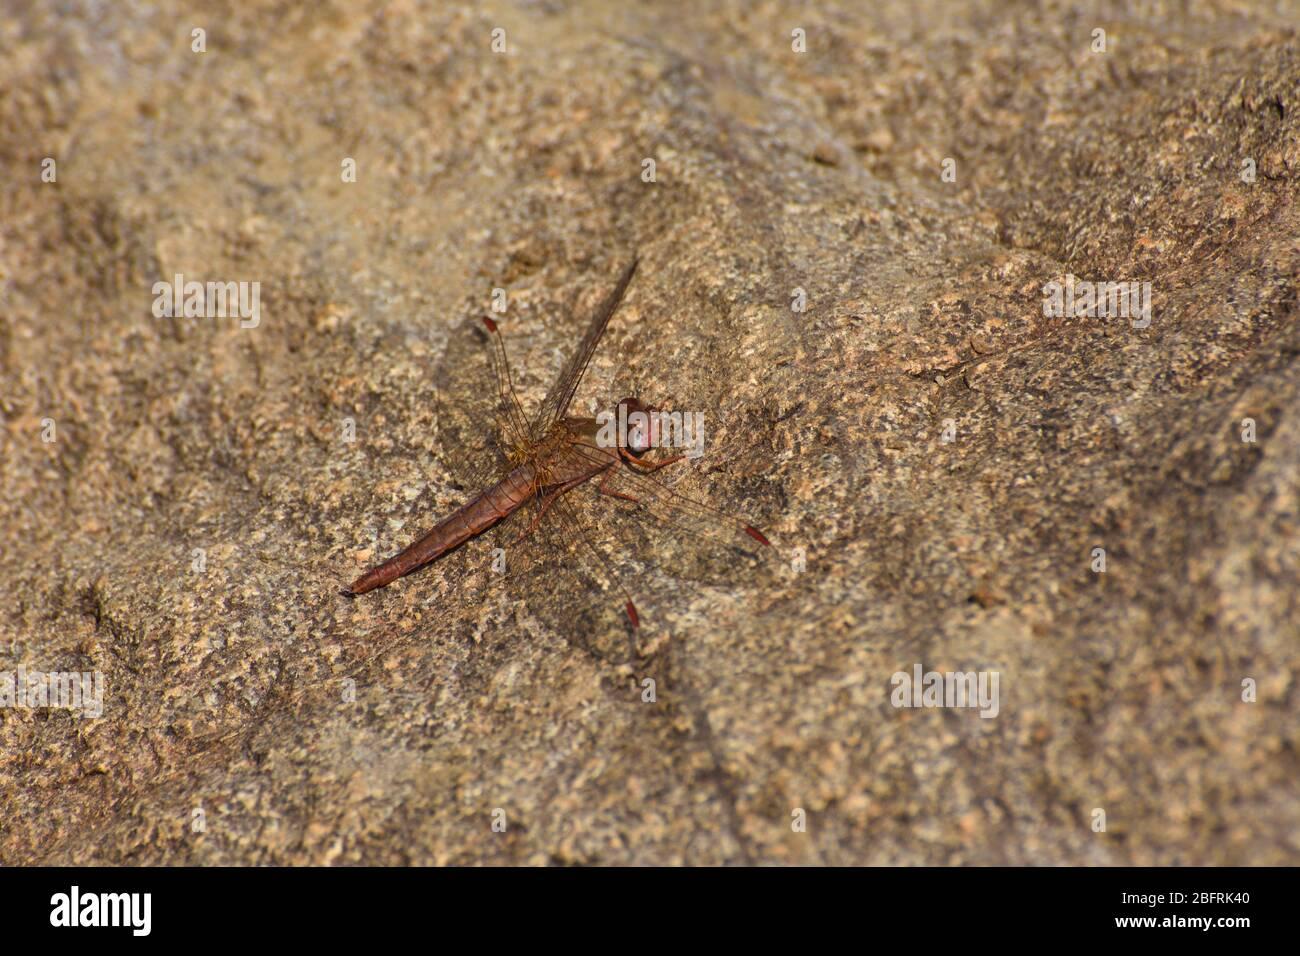 Female Broad Scarlet Dragonfly On Stone (Crocothemis erythraea) Stock Photo